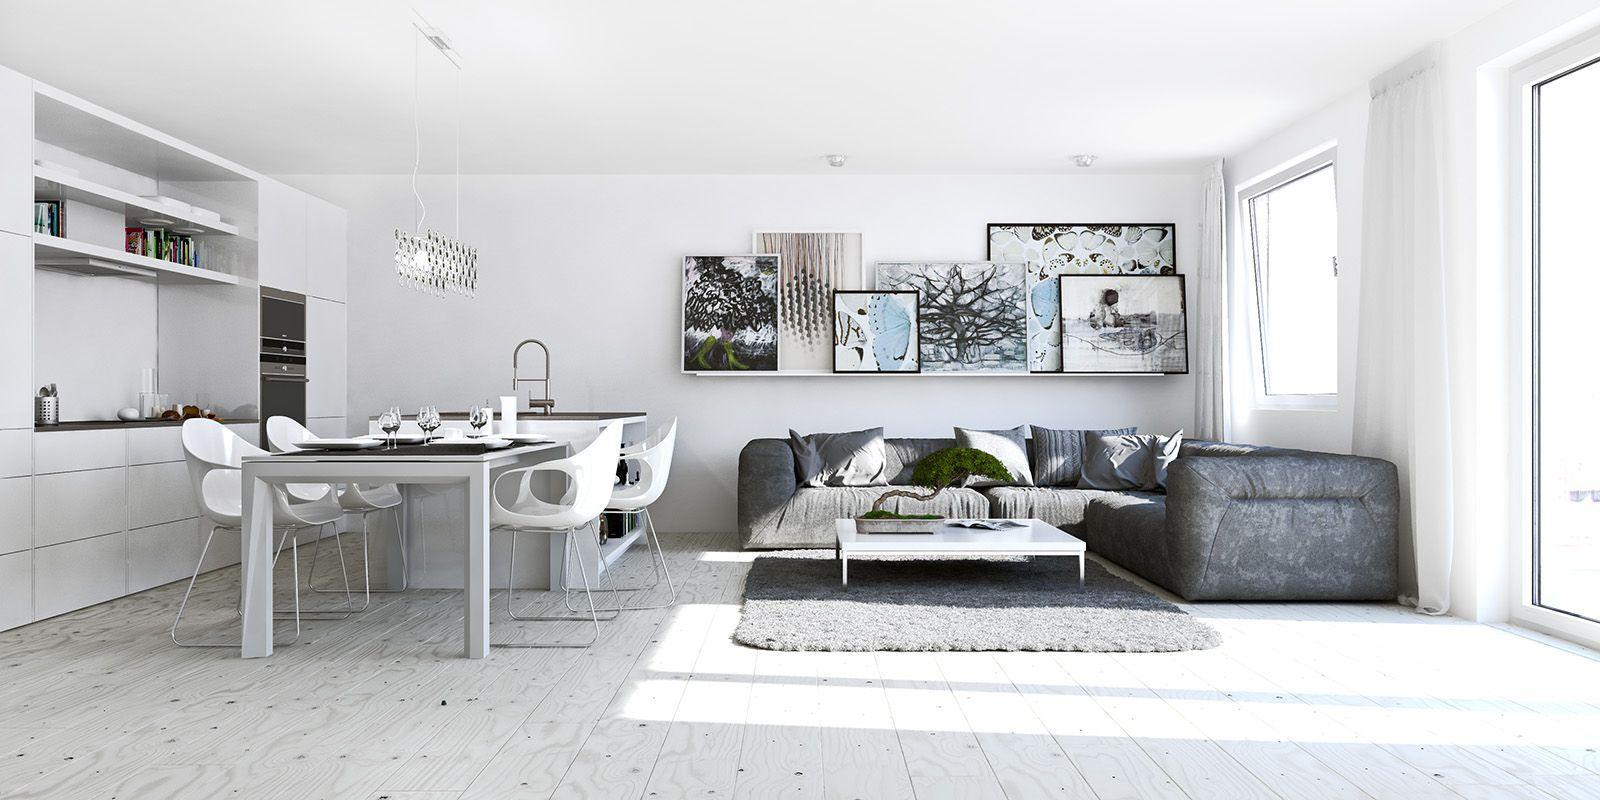 Studio Apartment Inspiration Apartment Inspiration  Sök På Google  Dream Home  Pinterest